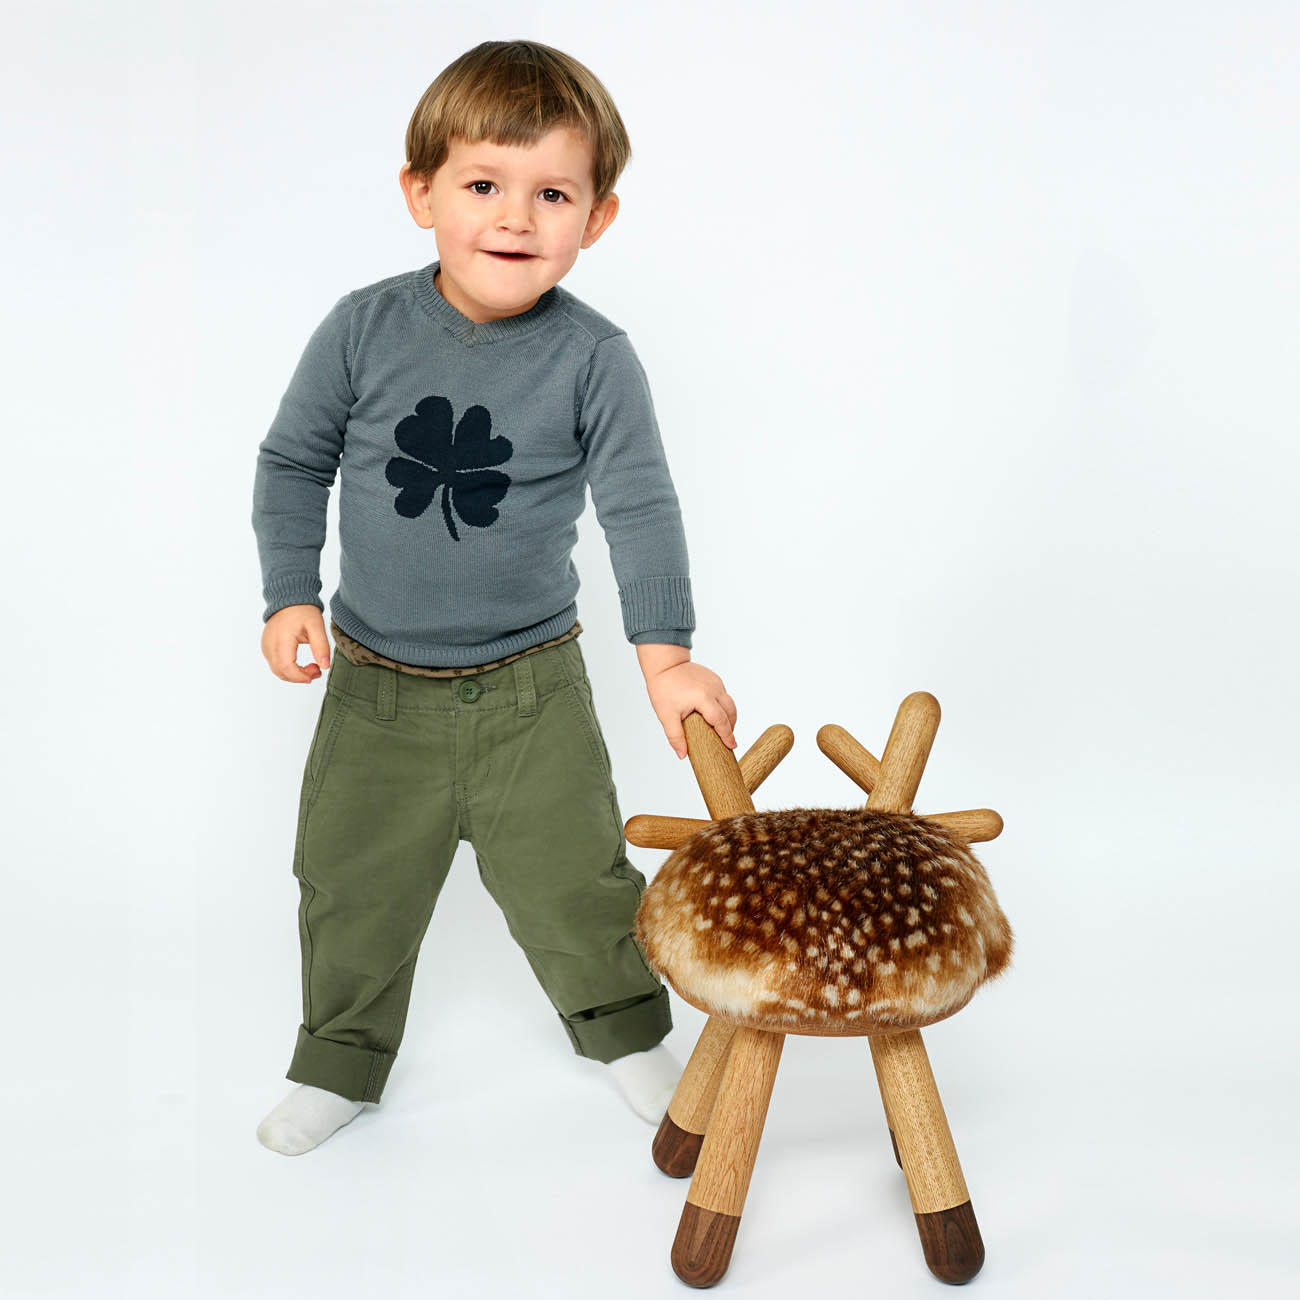 bambi chair webpelz 3 jahre garantie pro idee. Black Bedroom Furniture Sets. Home Design Ideas